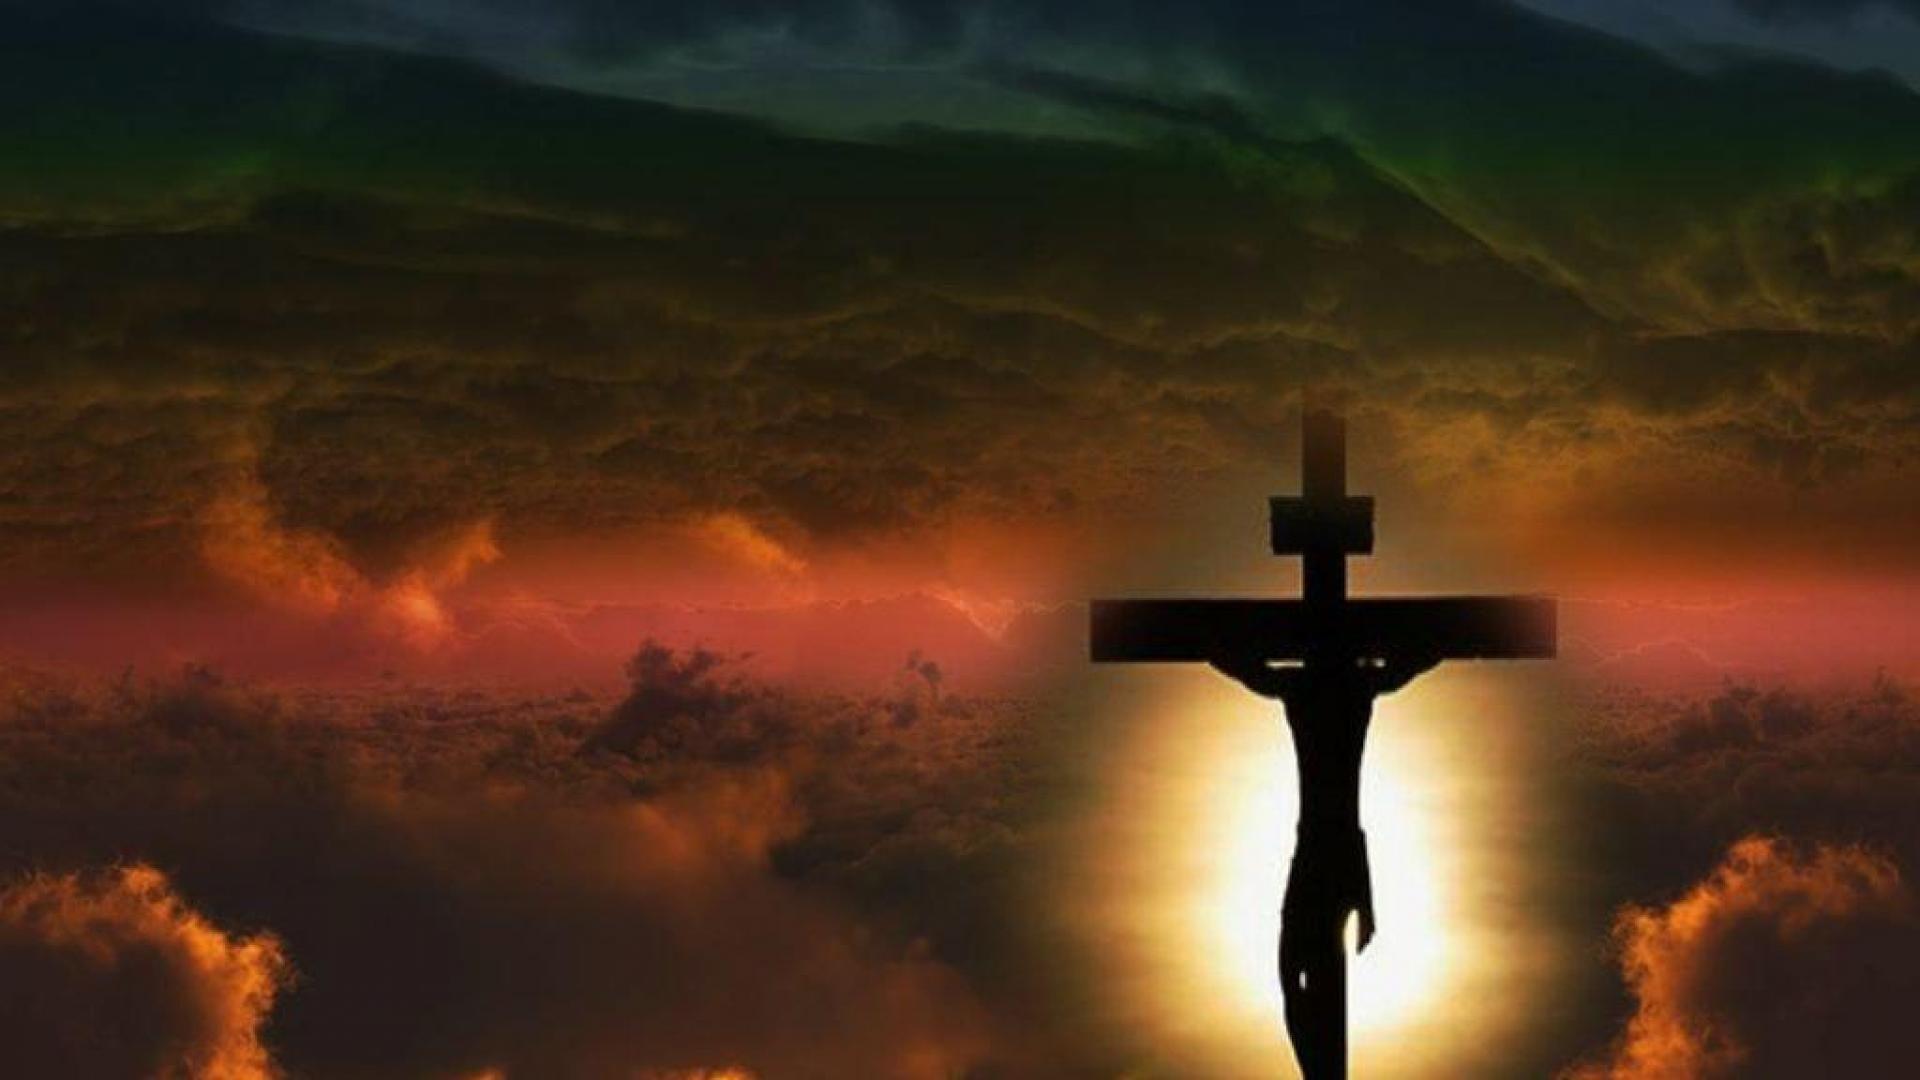 Hd Jesus Wallpapers 1920x1080 In 2020 Jesus Wallpaper Heaven Wallpaper Jesus Background